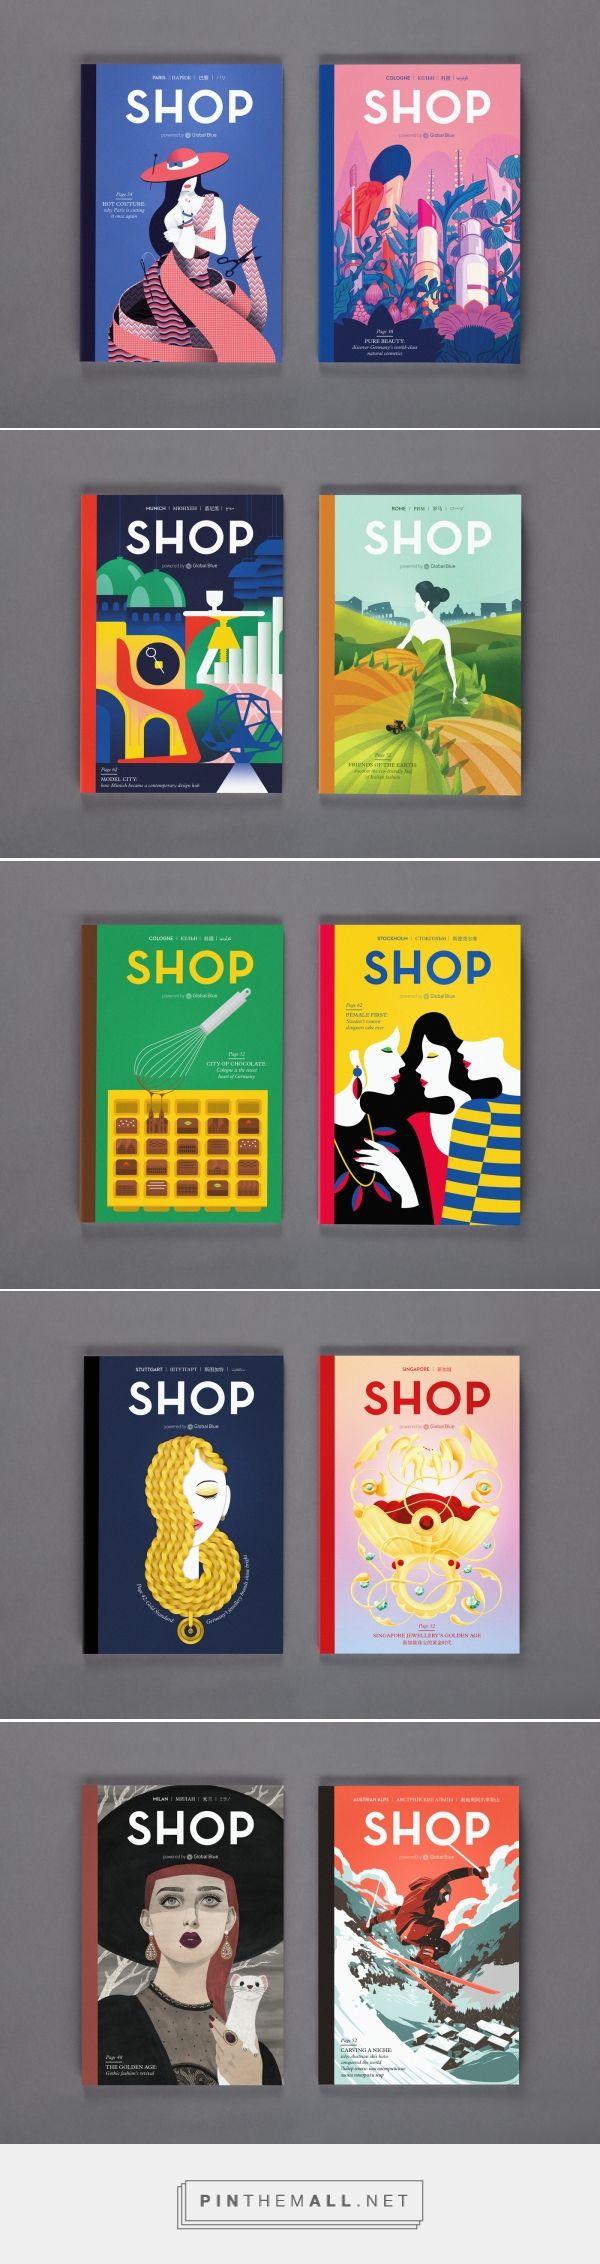 SHOP Magazine 2015   Design by S-T